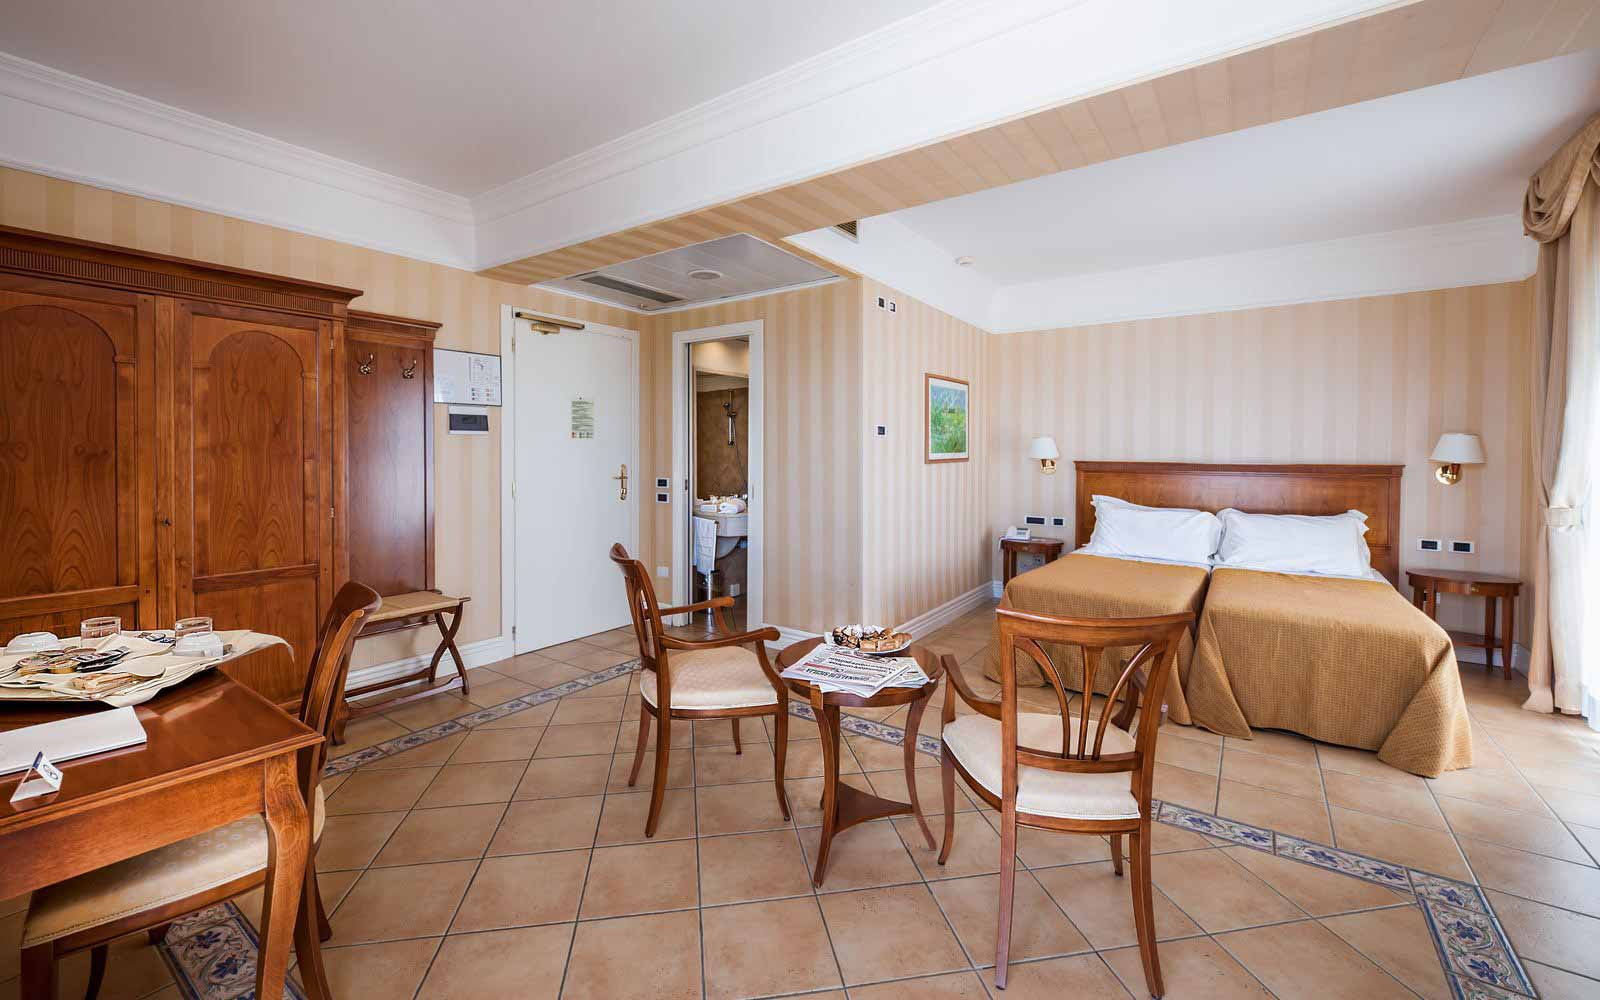 Junior suite at Dioscuri Bay Palace